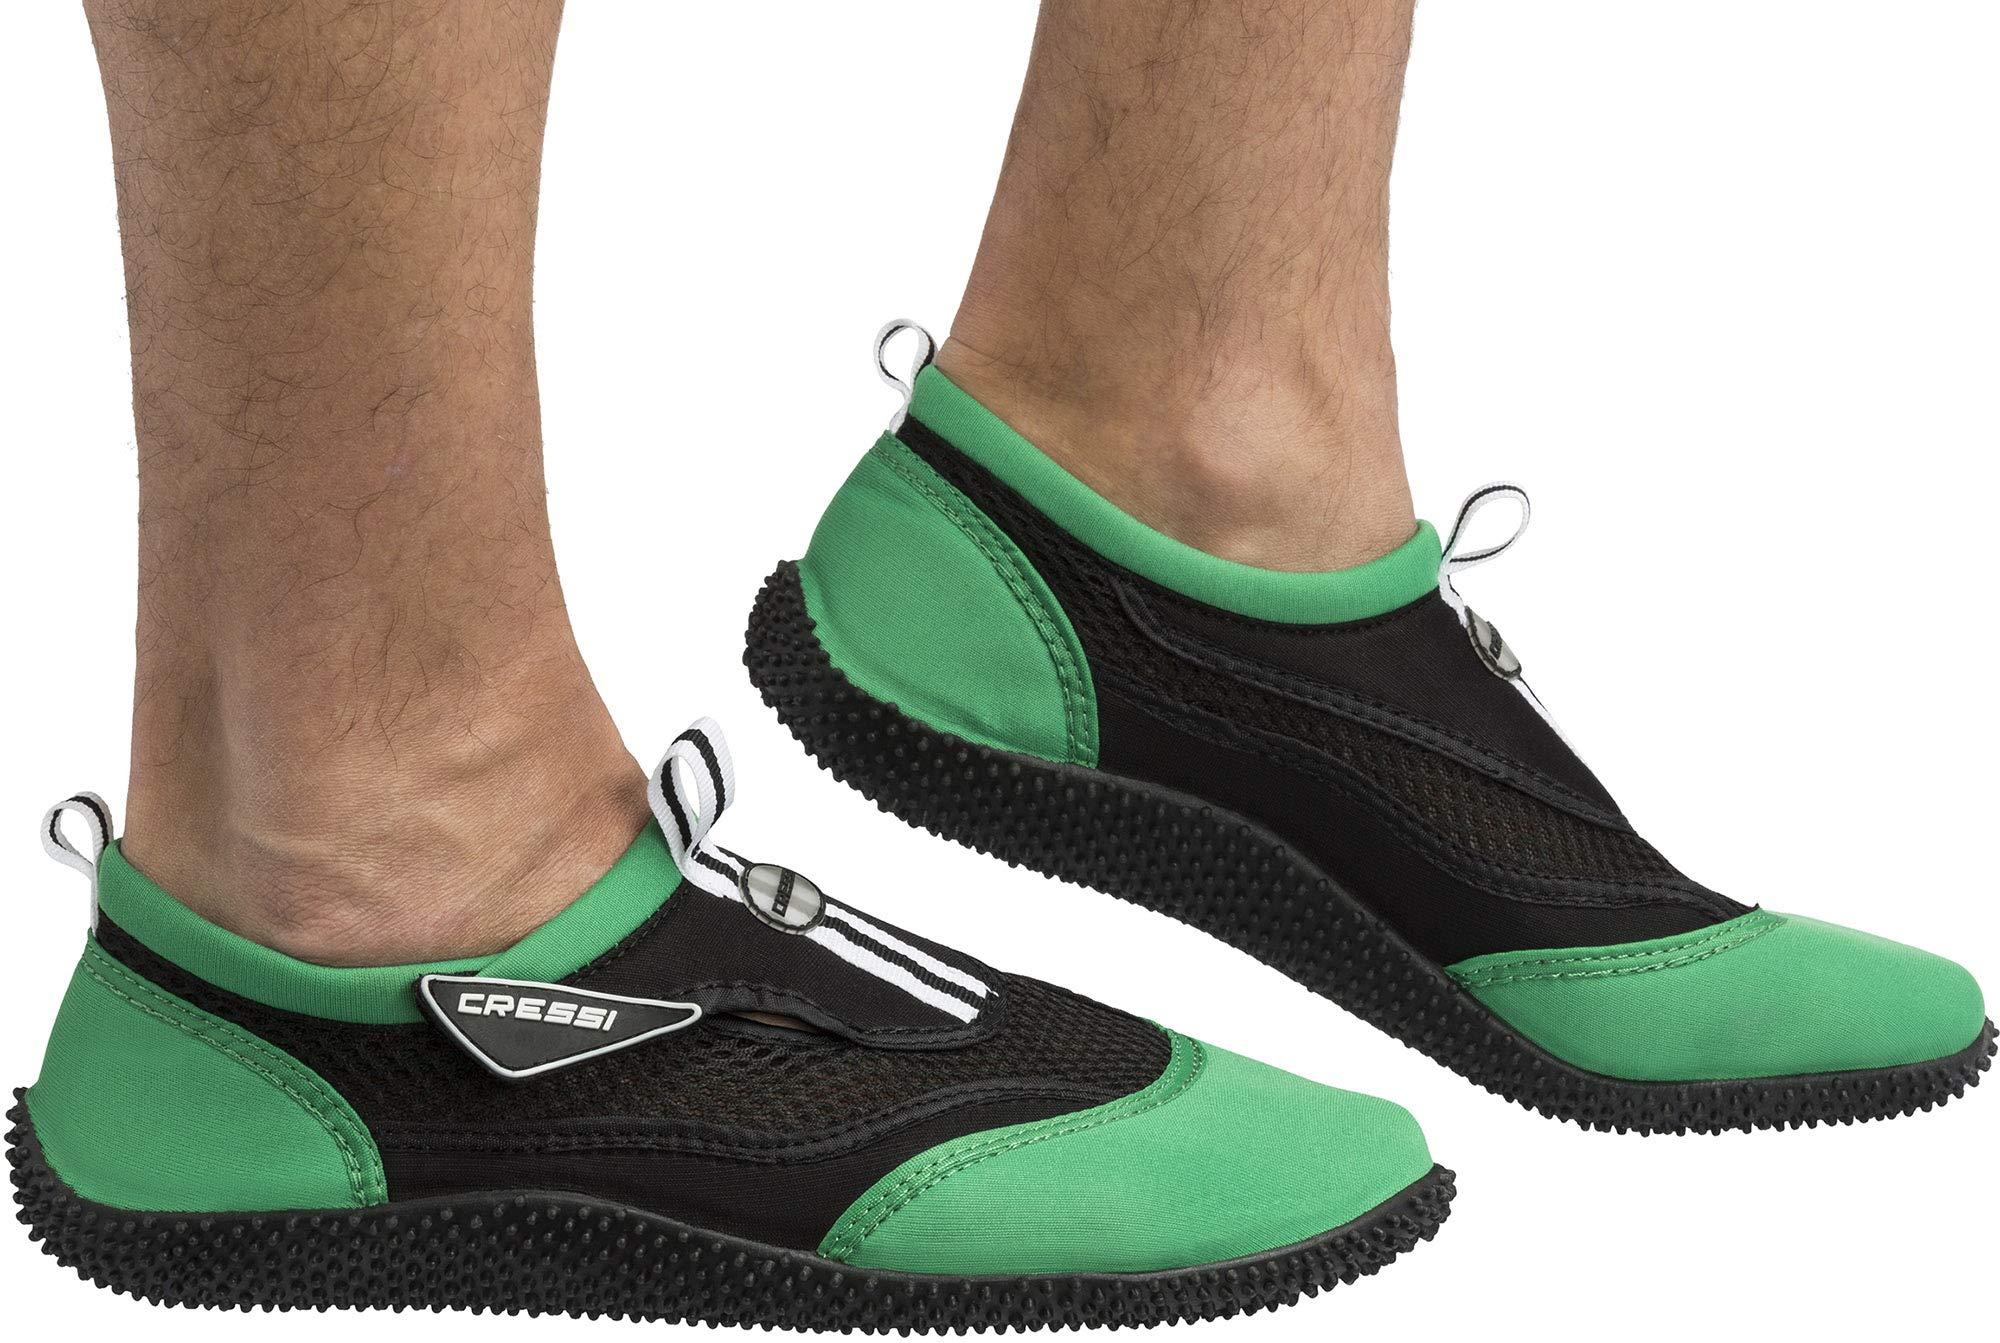 Cressi Unisex Reef Shoes Badeschuhe, schwarz (Schwarz/Lime), 37 EU